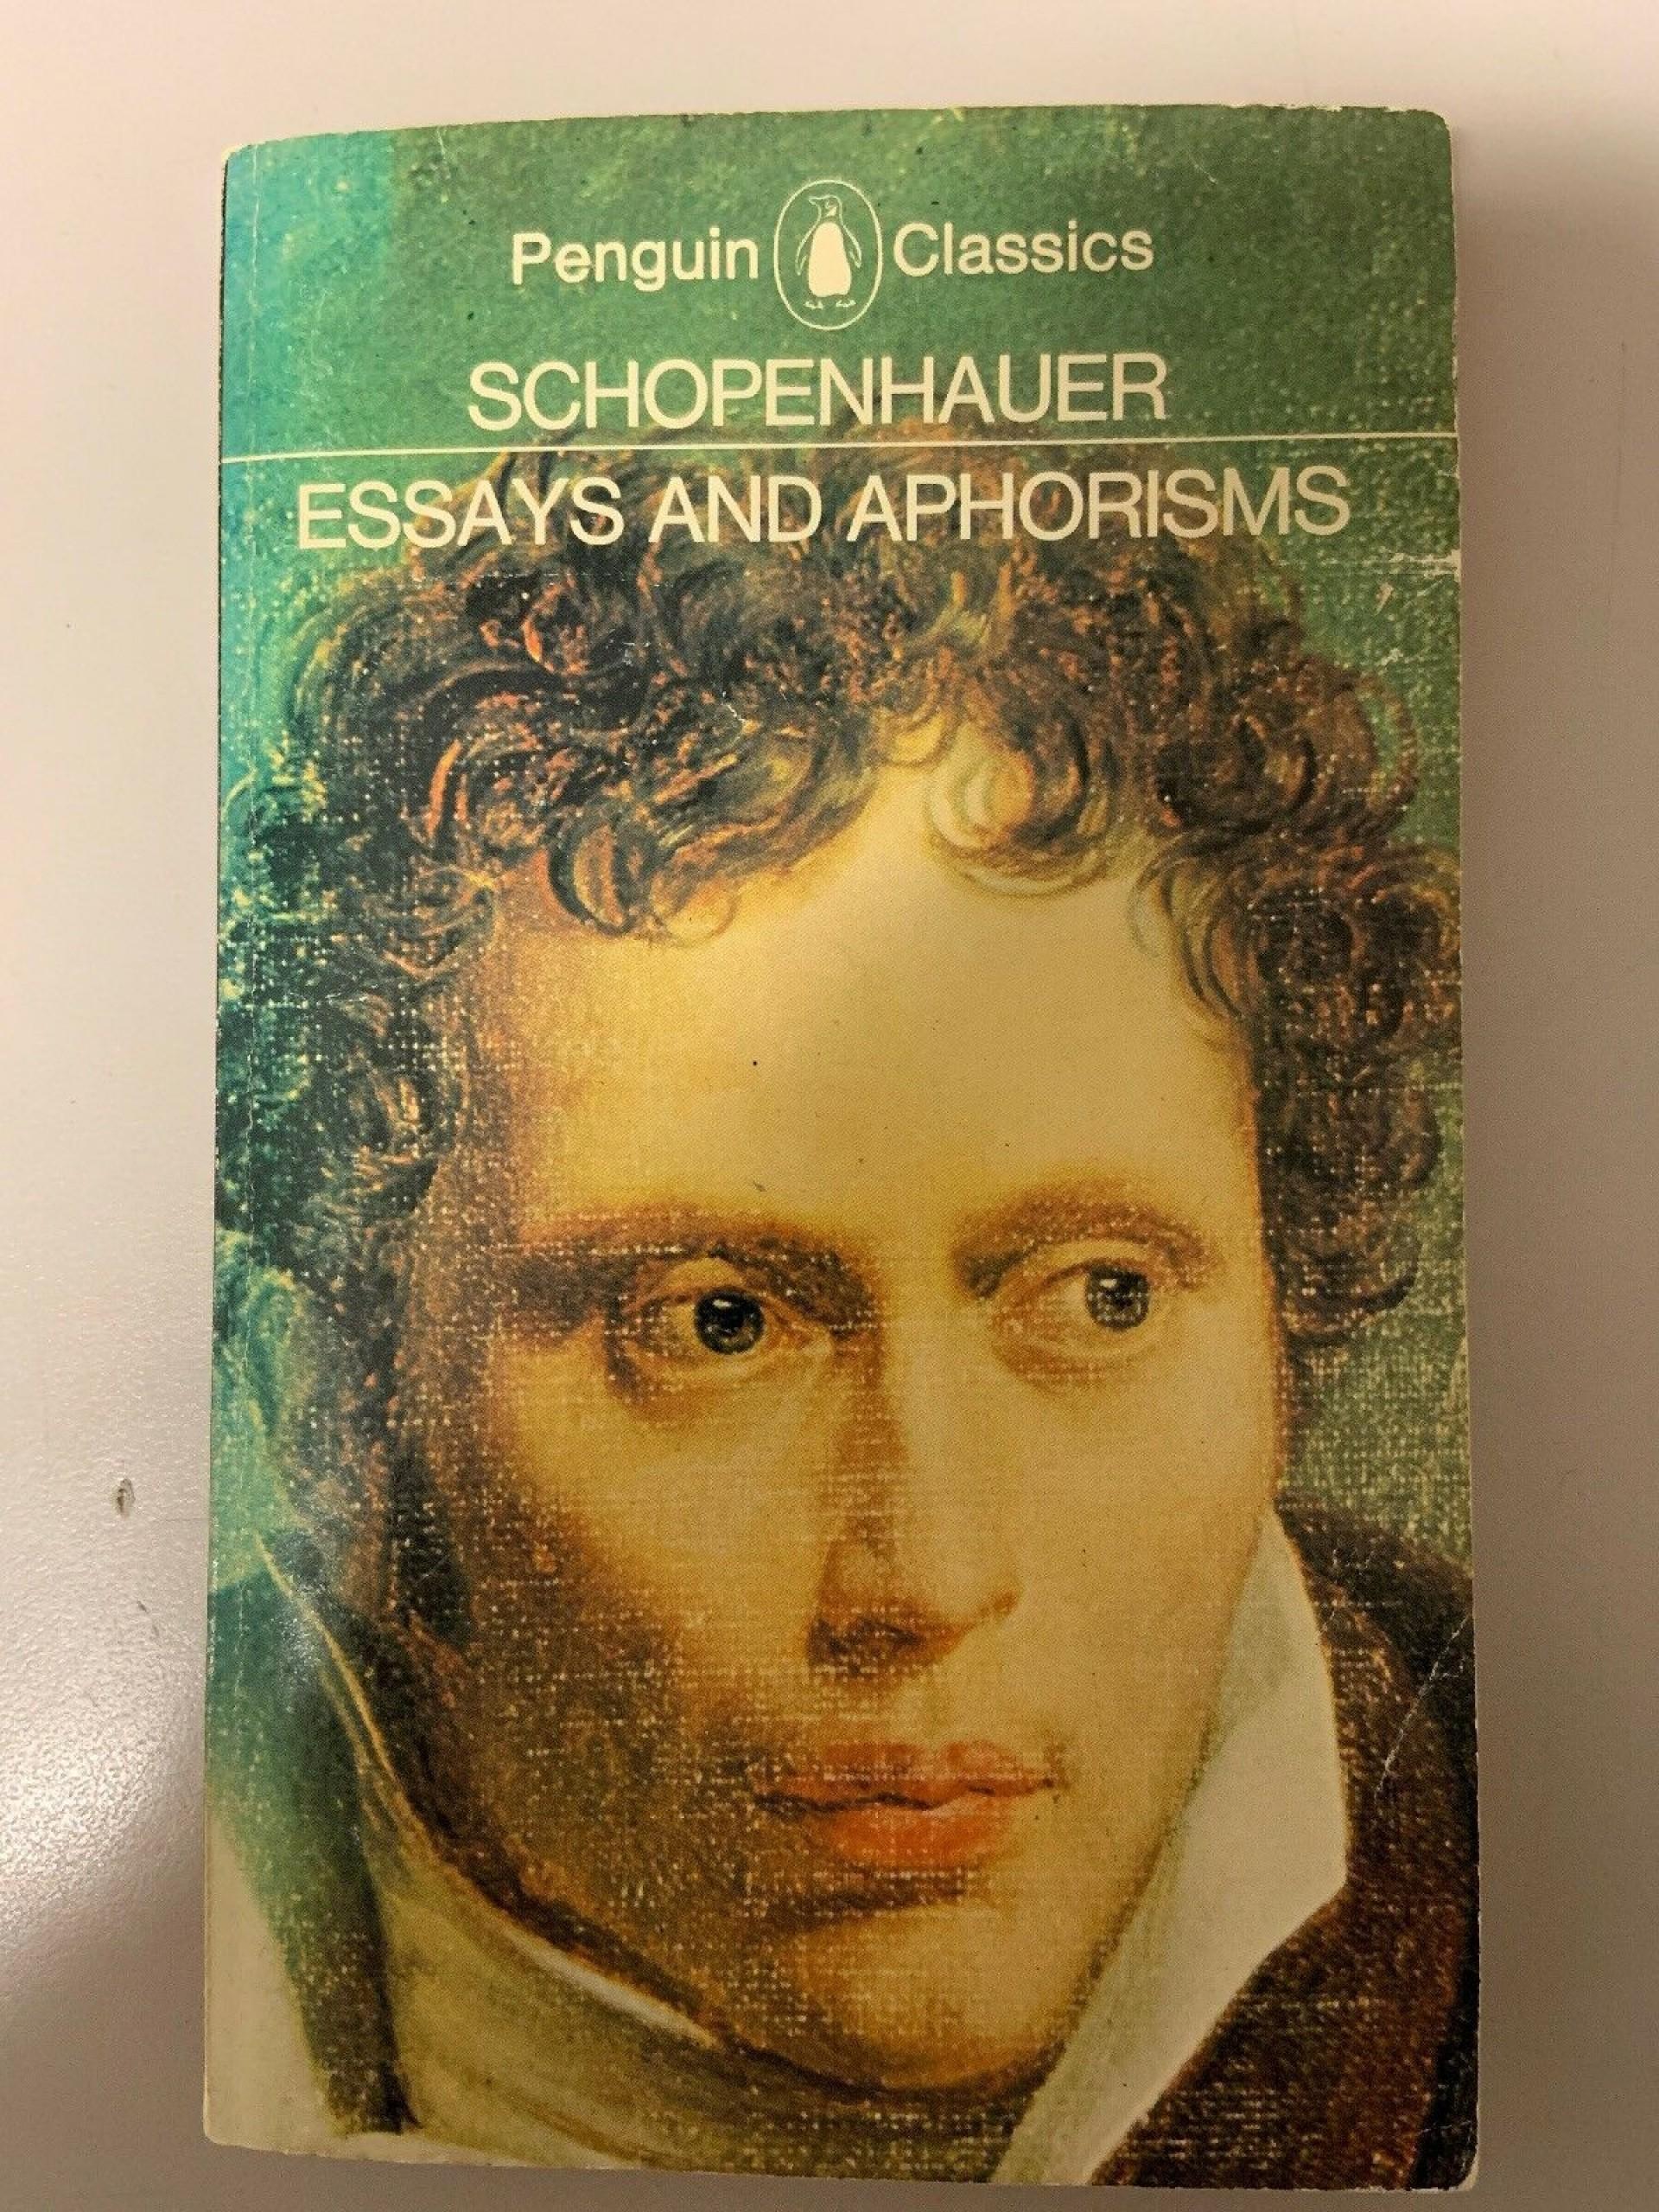 006 S L1600 Essays And Aphorisms Essay Frightening By Arthur Schopenhauer Pdf 1920